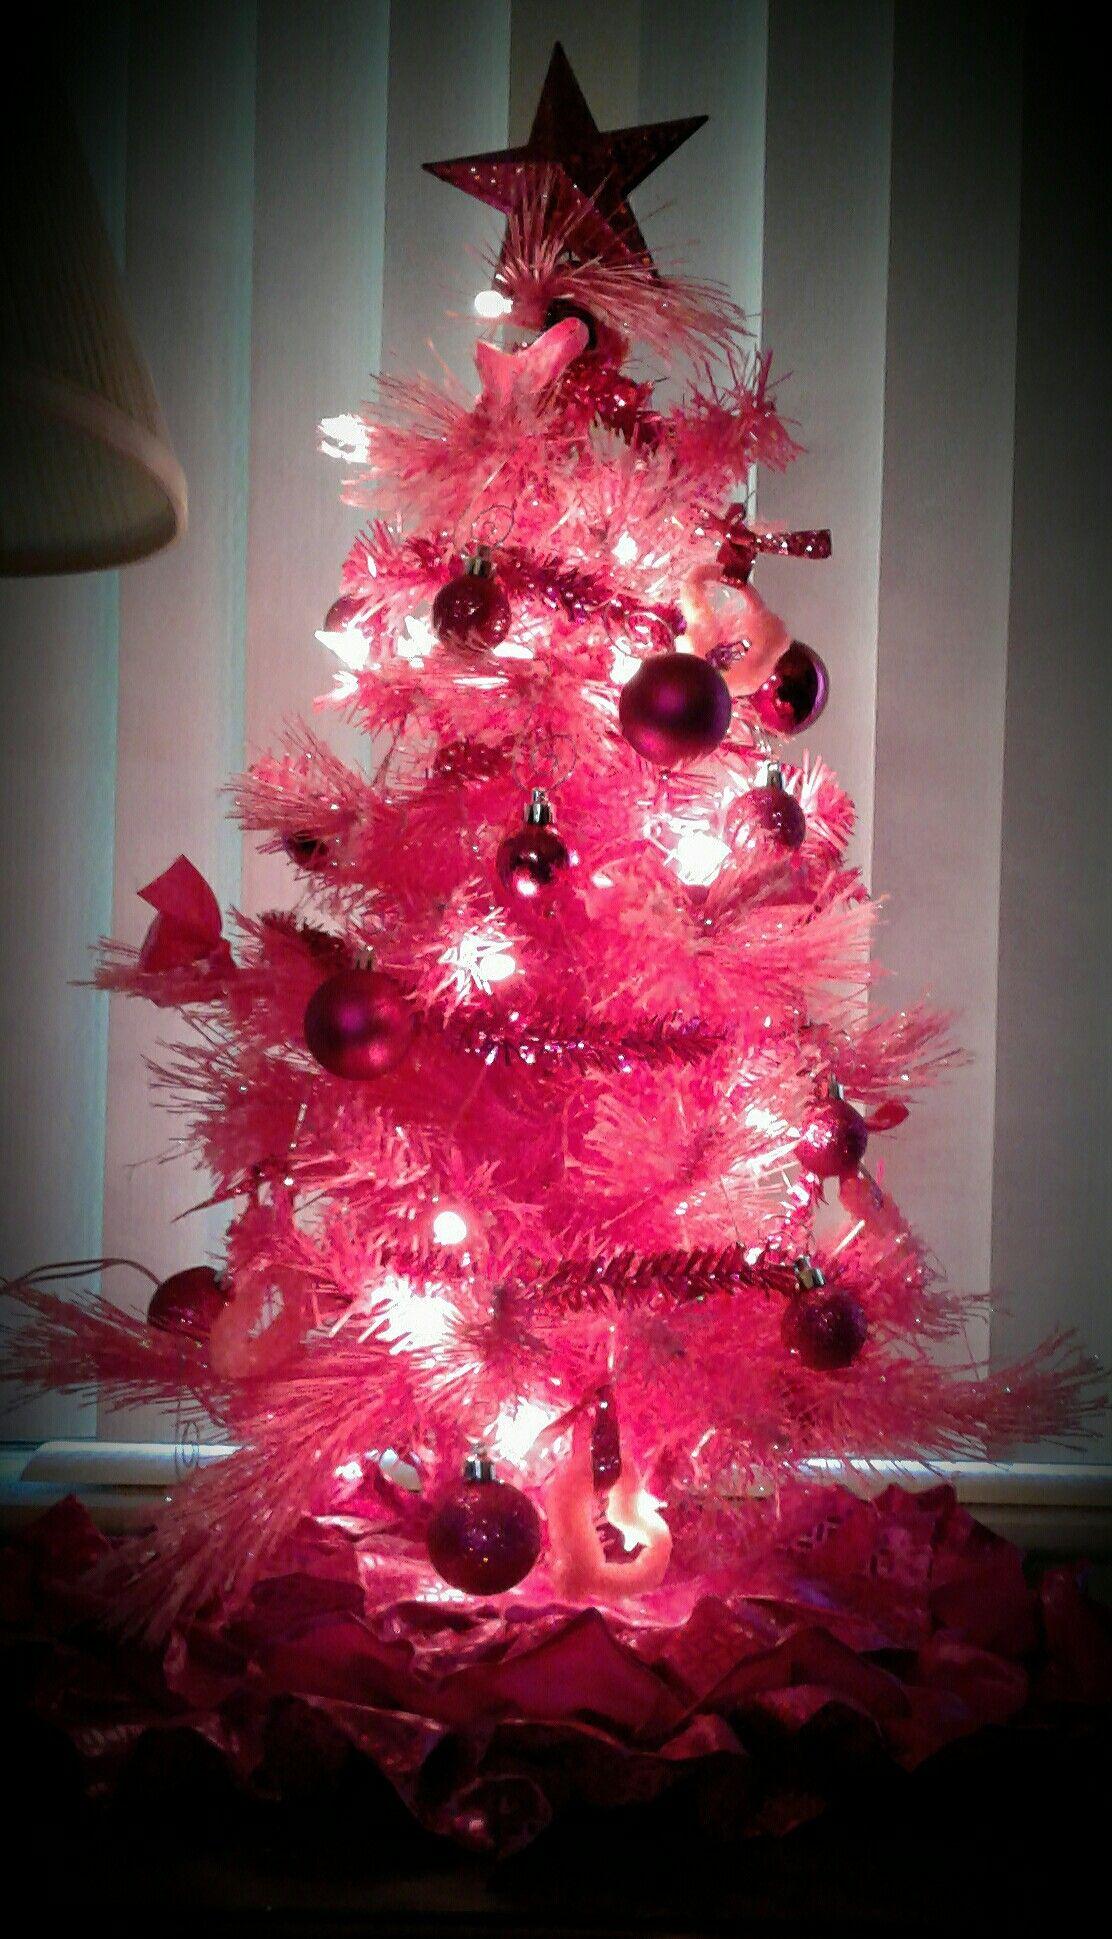 hot pink christmas tree i finally got my dream tree mini pink christmas tree